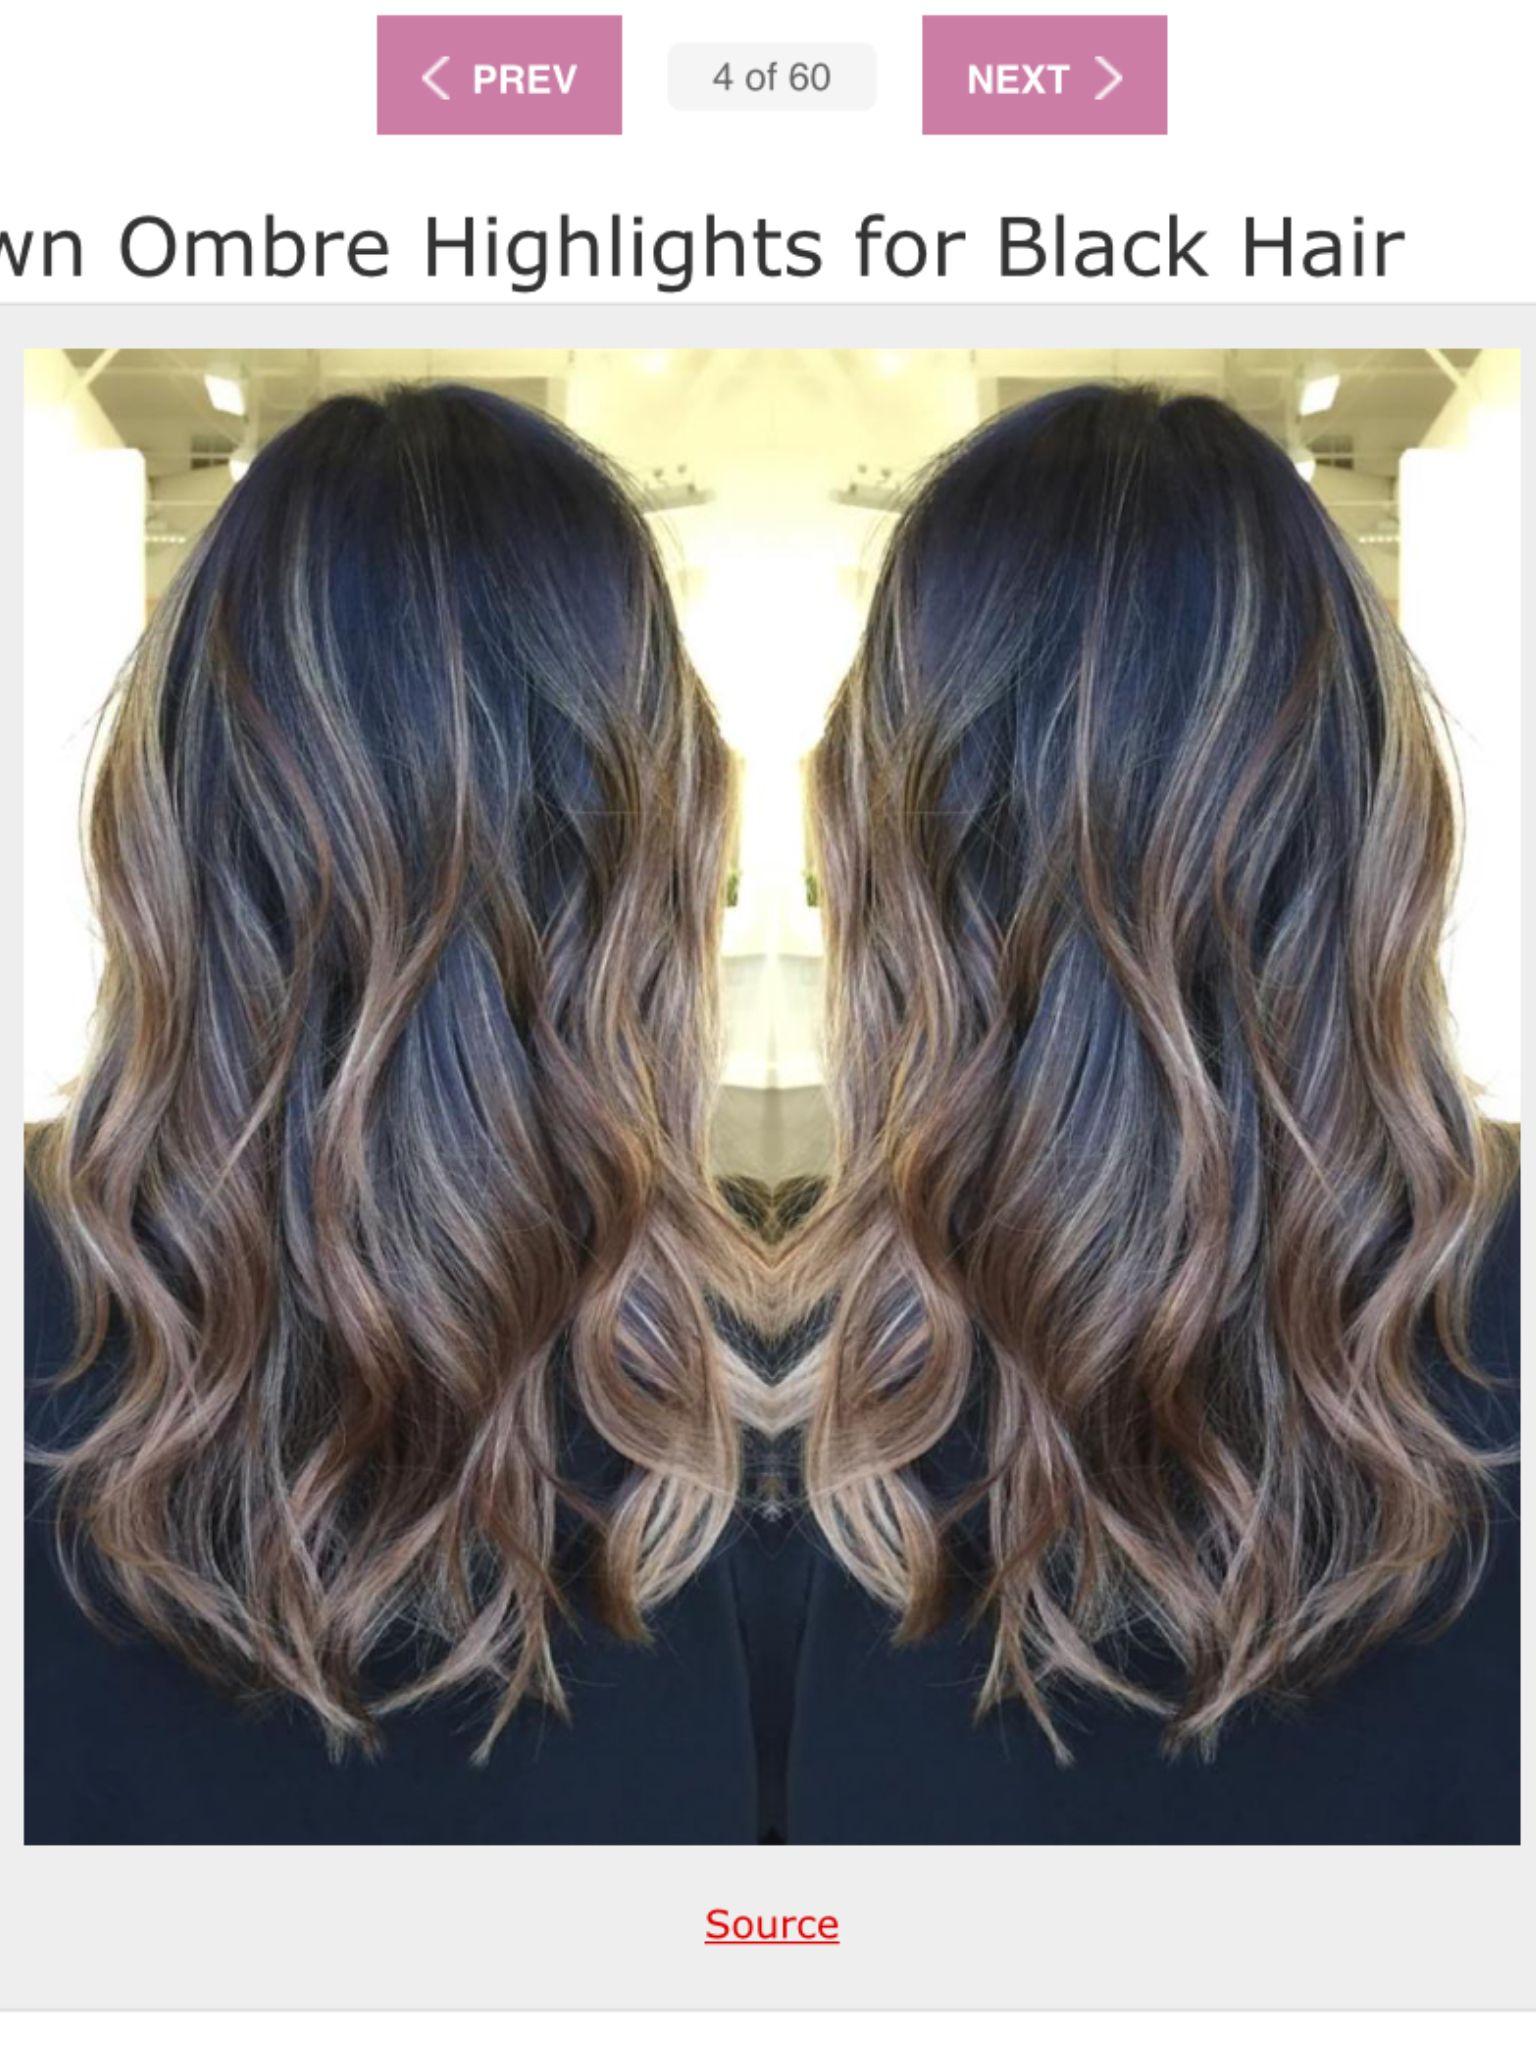 I like this hair Балаяж pinterest hair coloring hair style